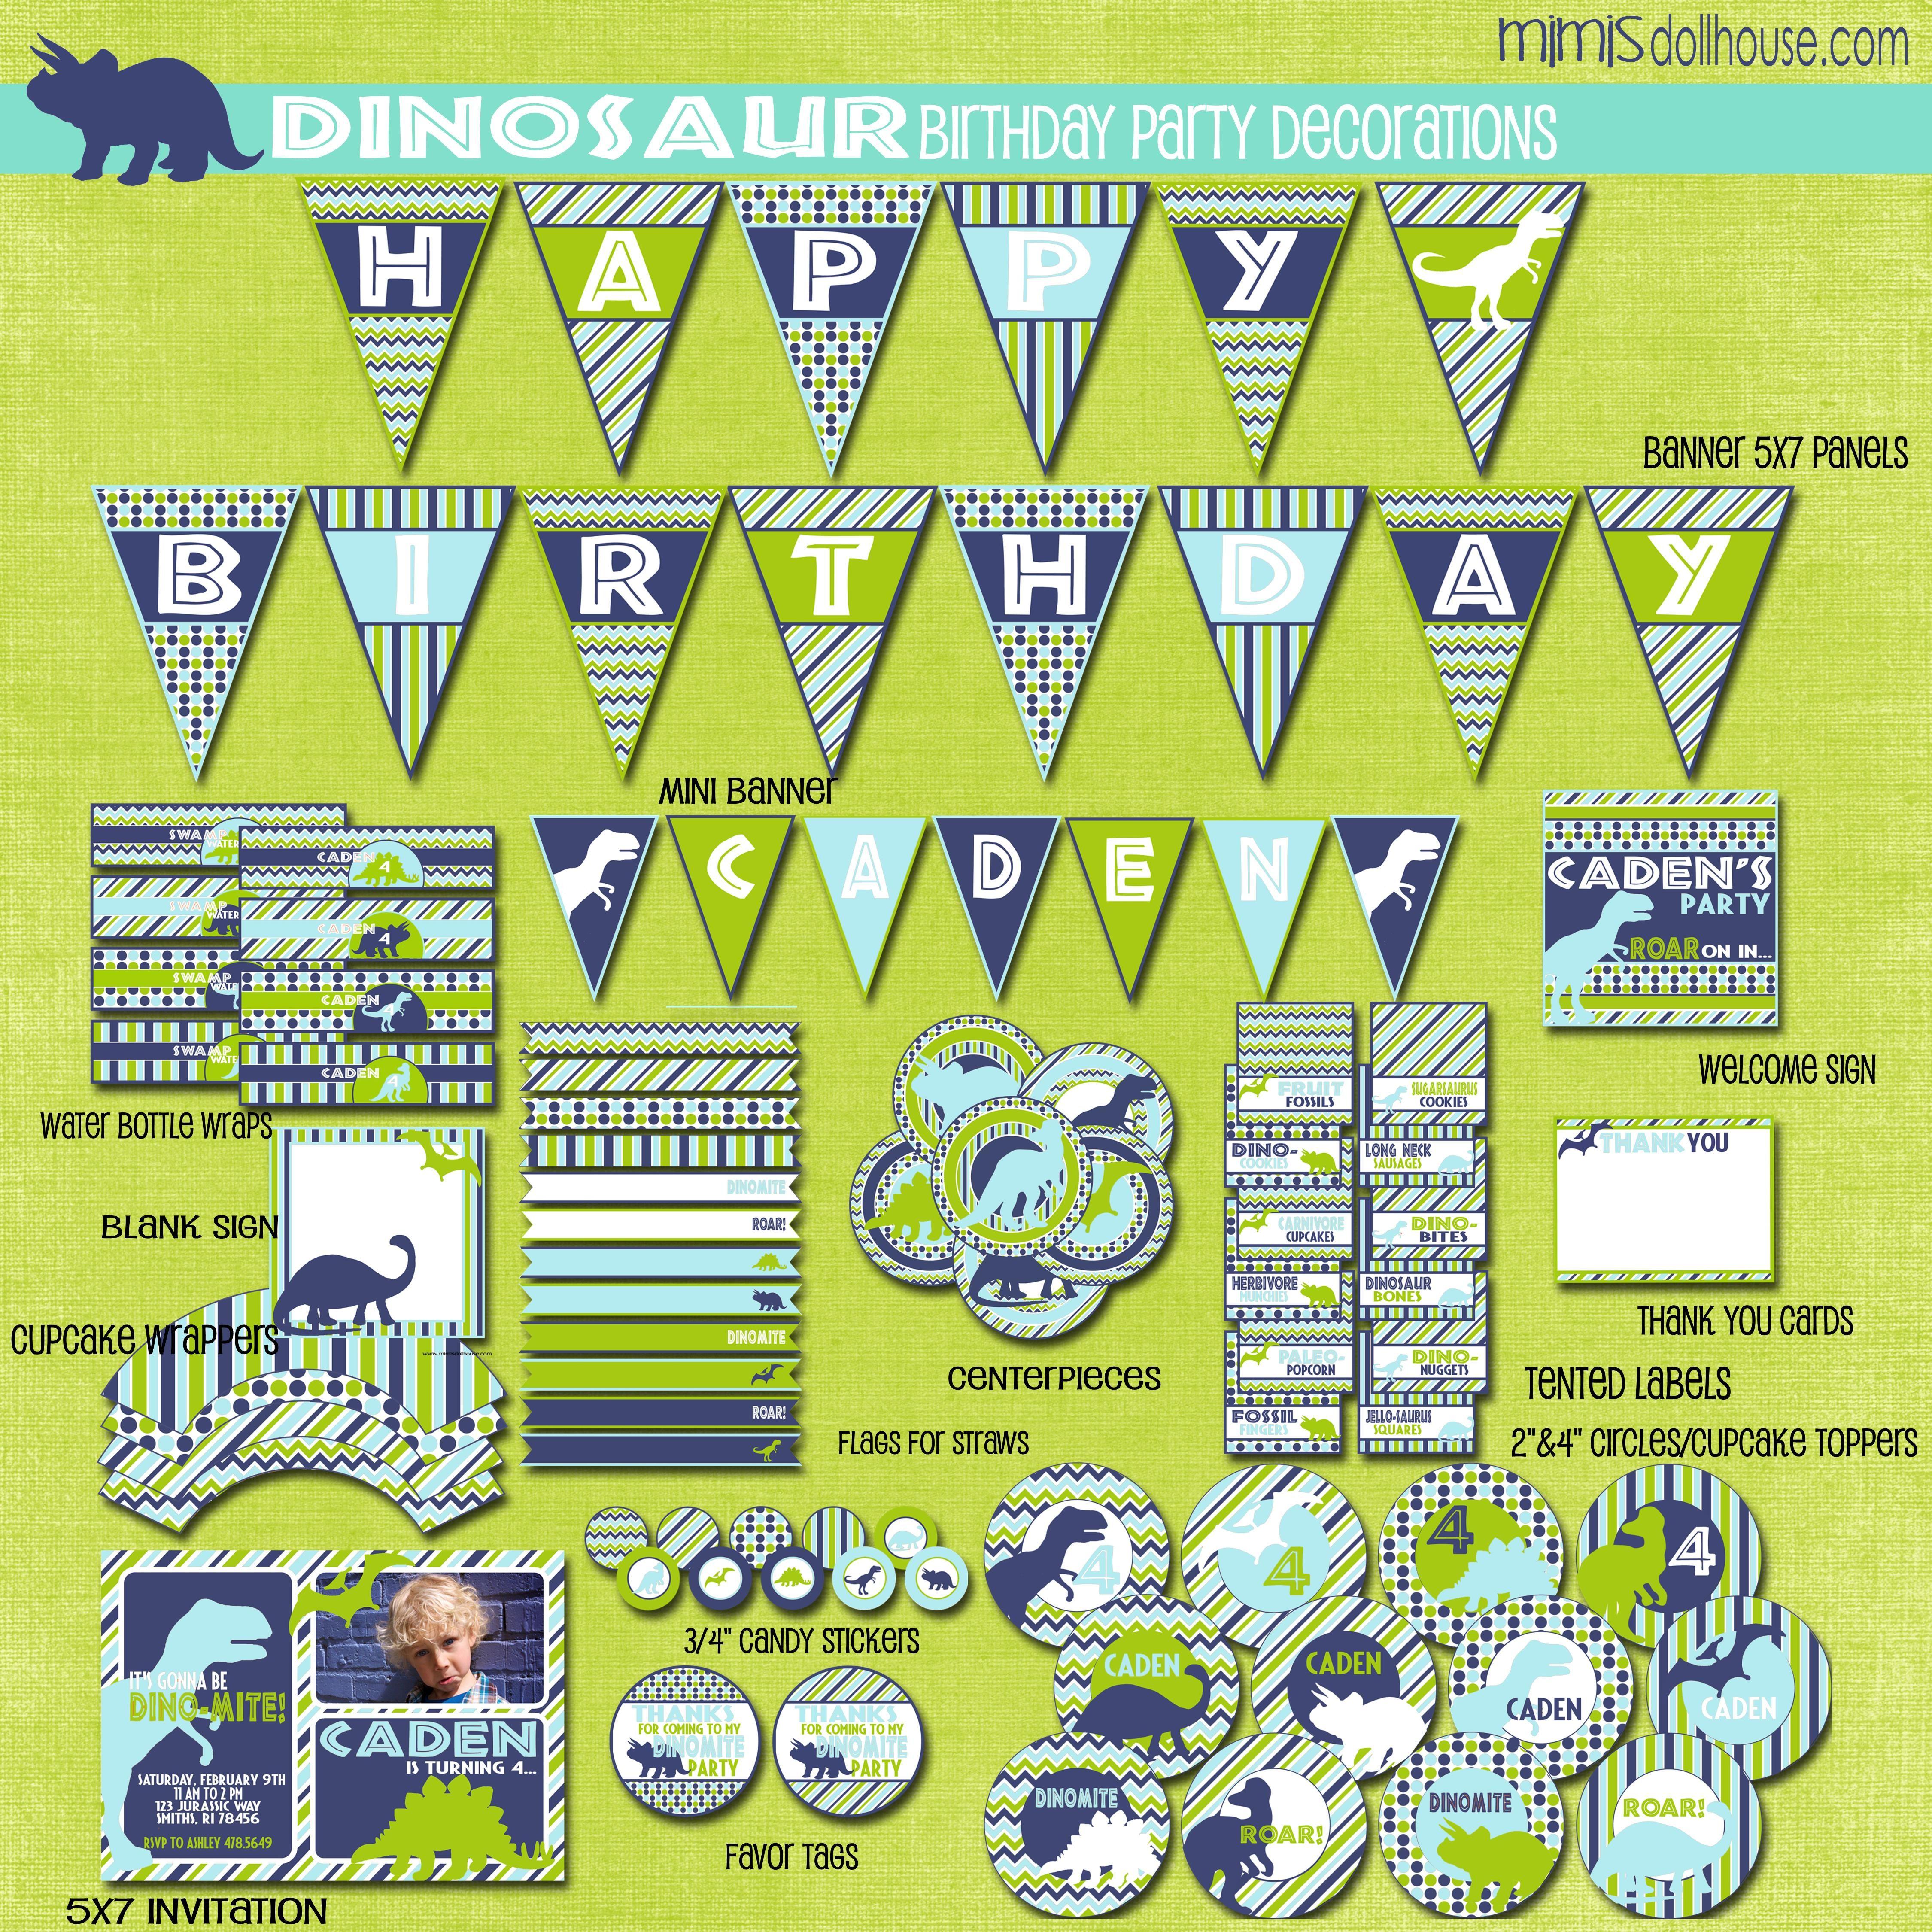 dinosaur party ideas Google Search Dinosaur party Pinterest